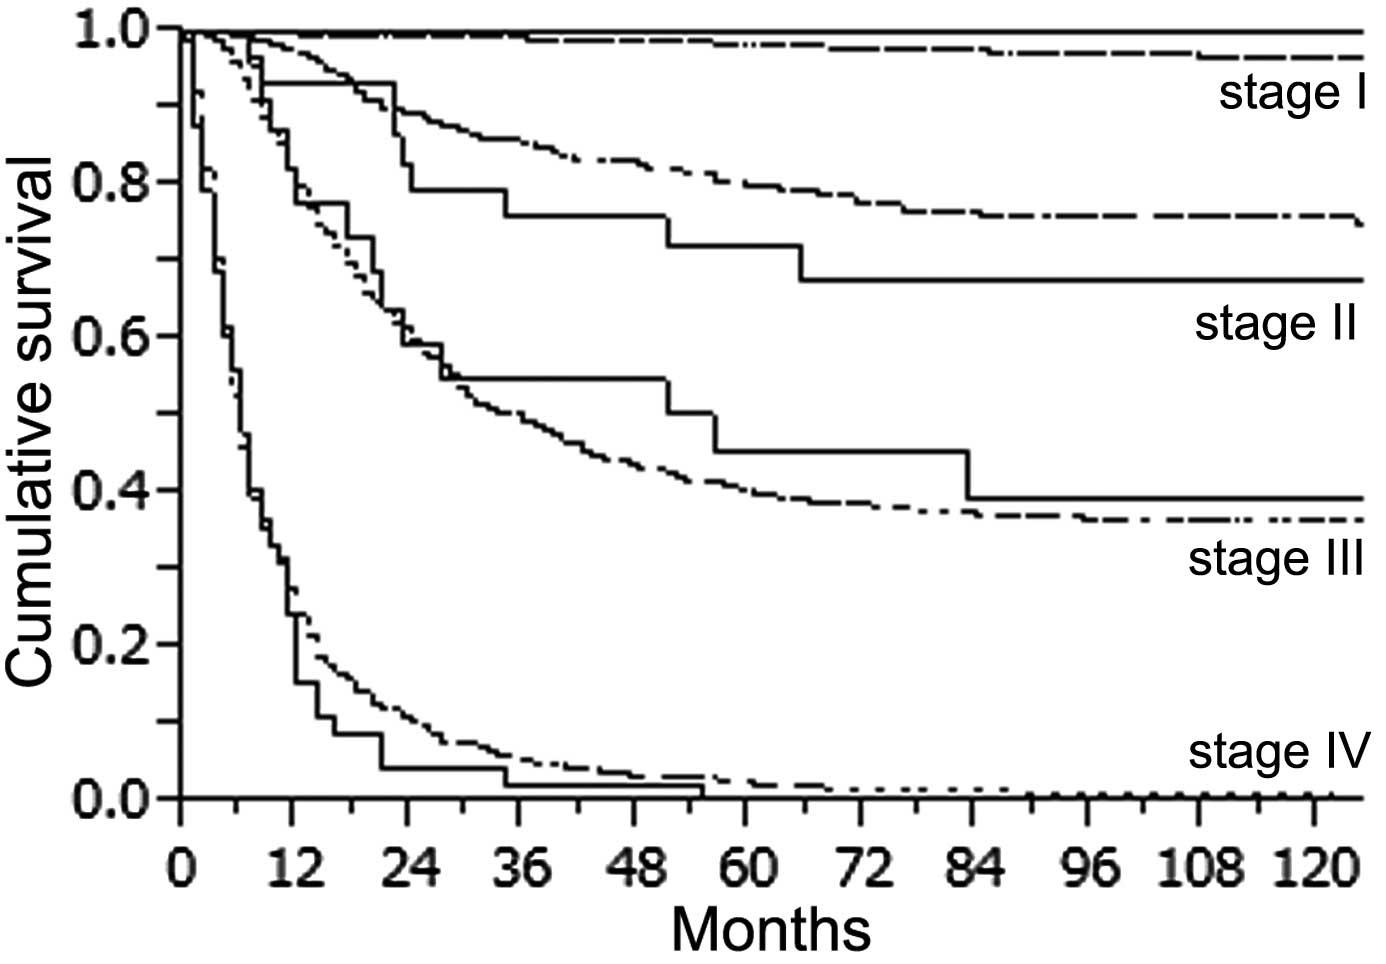 abdominal cancer survival rates